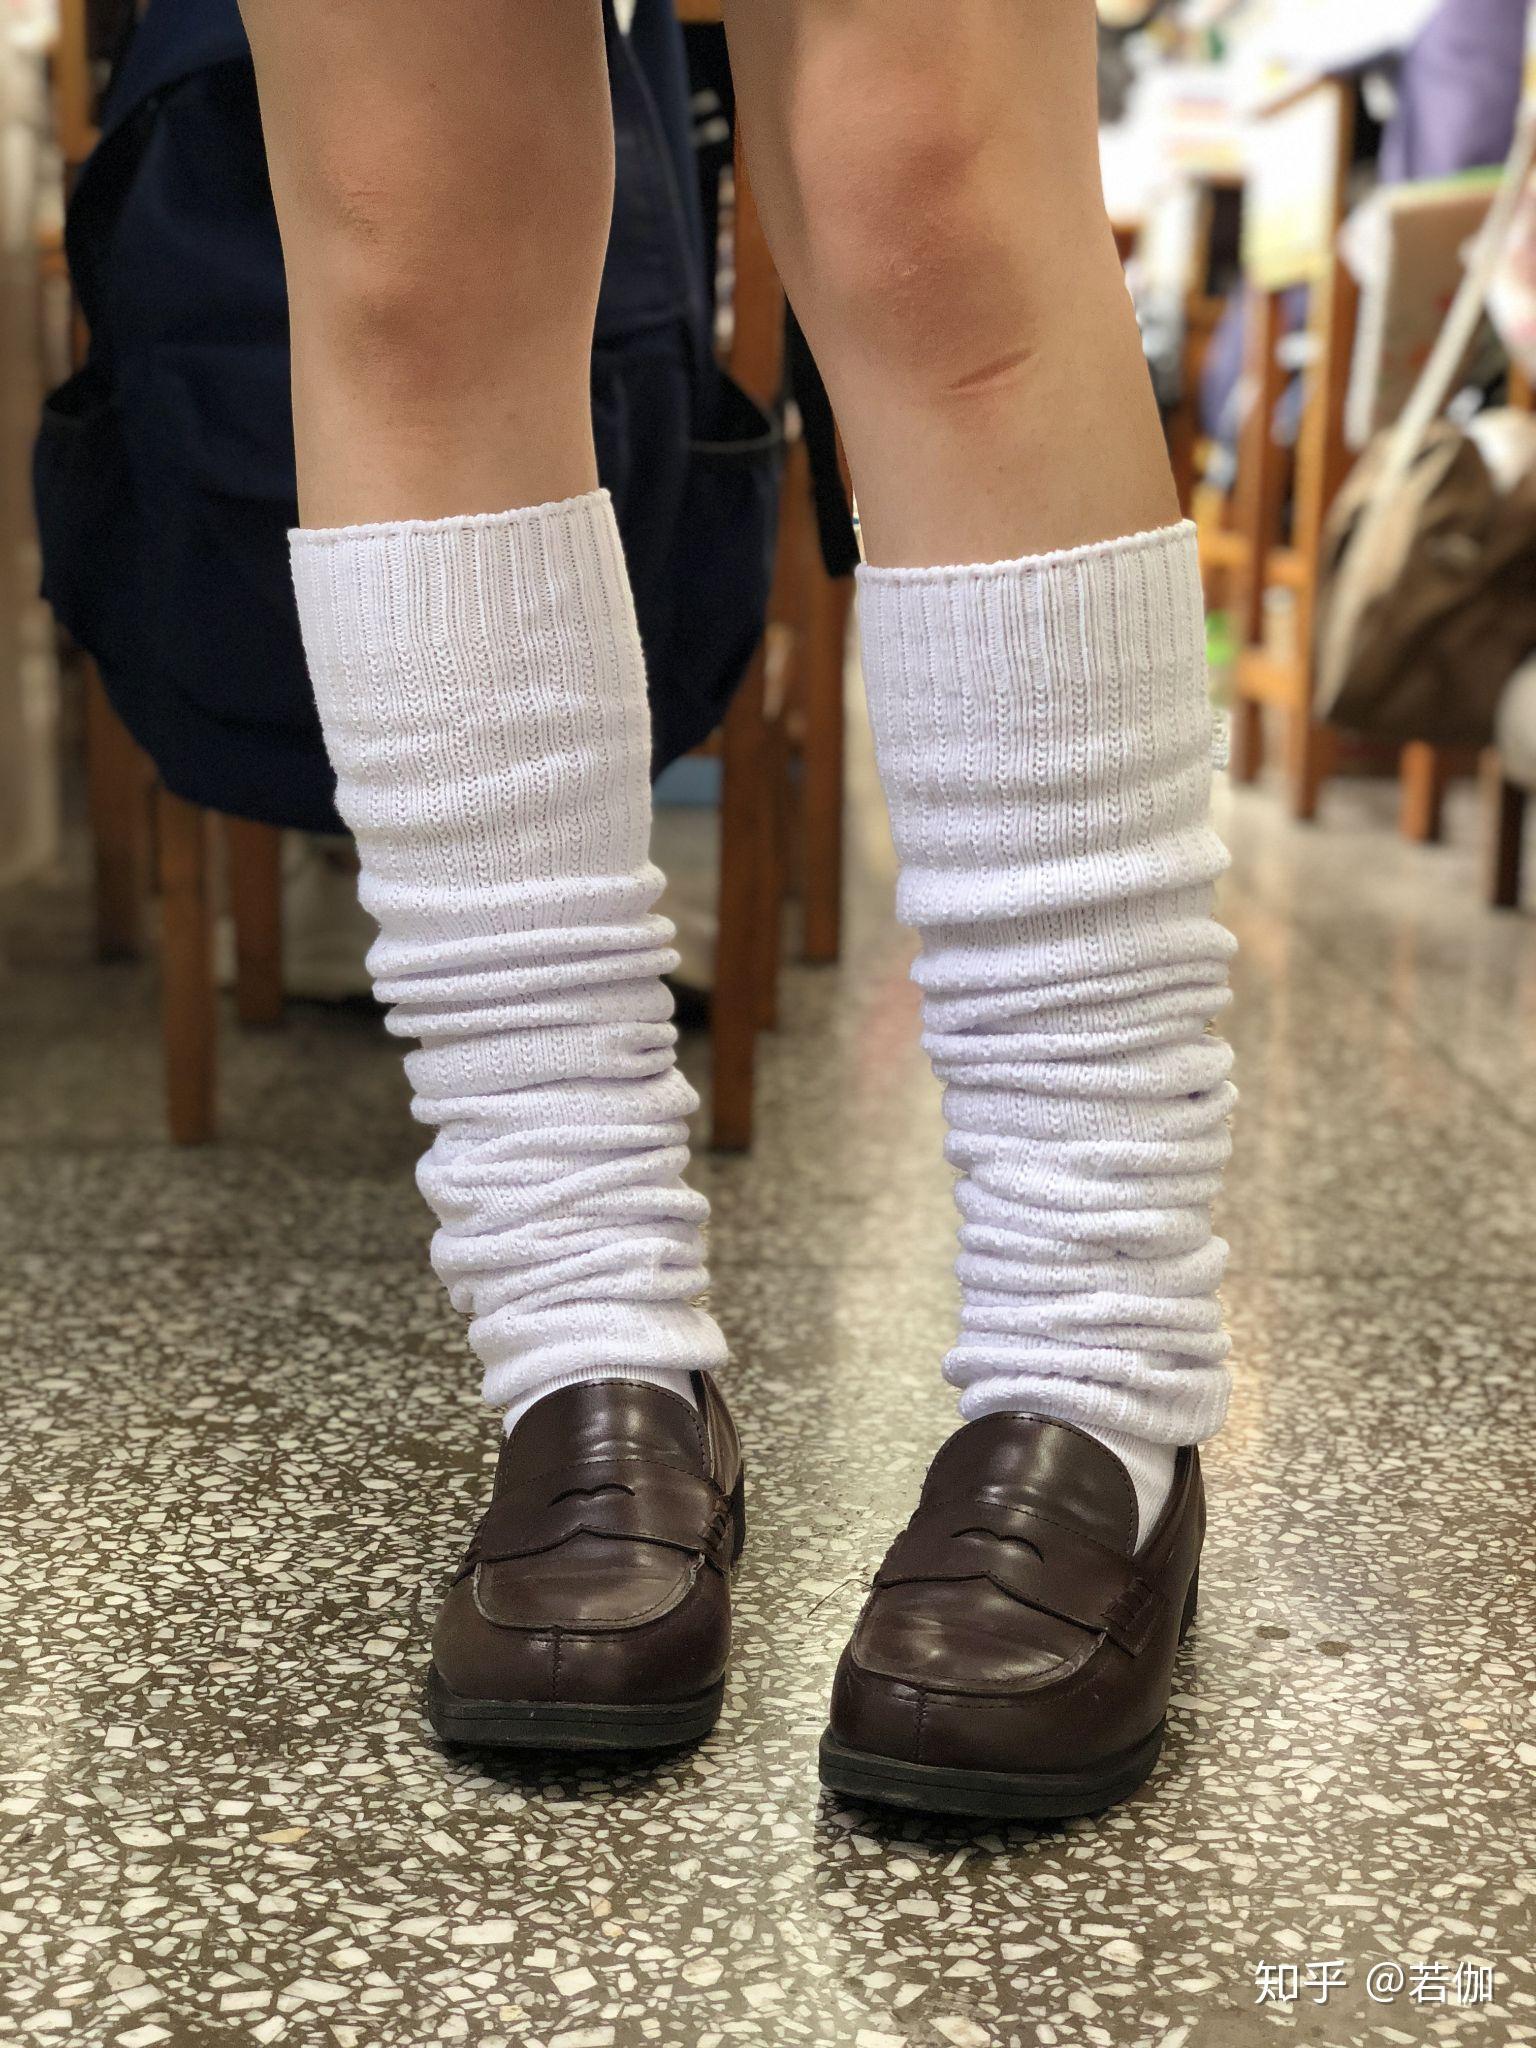 jk配白色袜子_JK制服有哪些款式呢? - 知乎